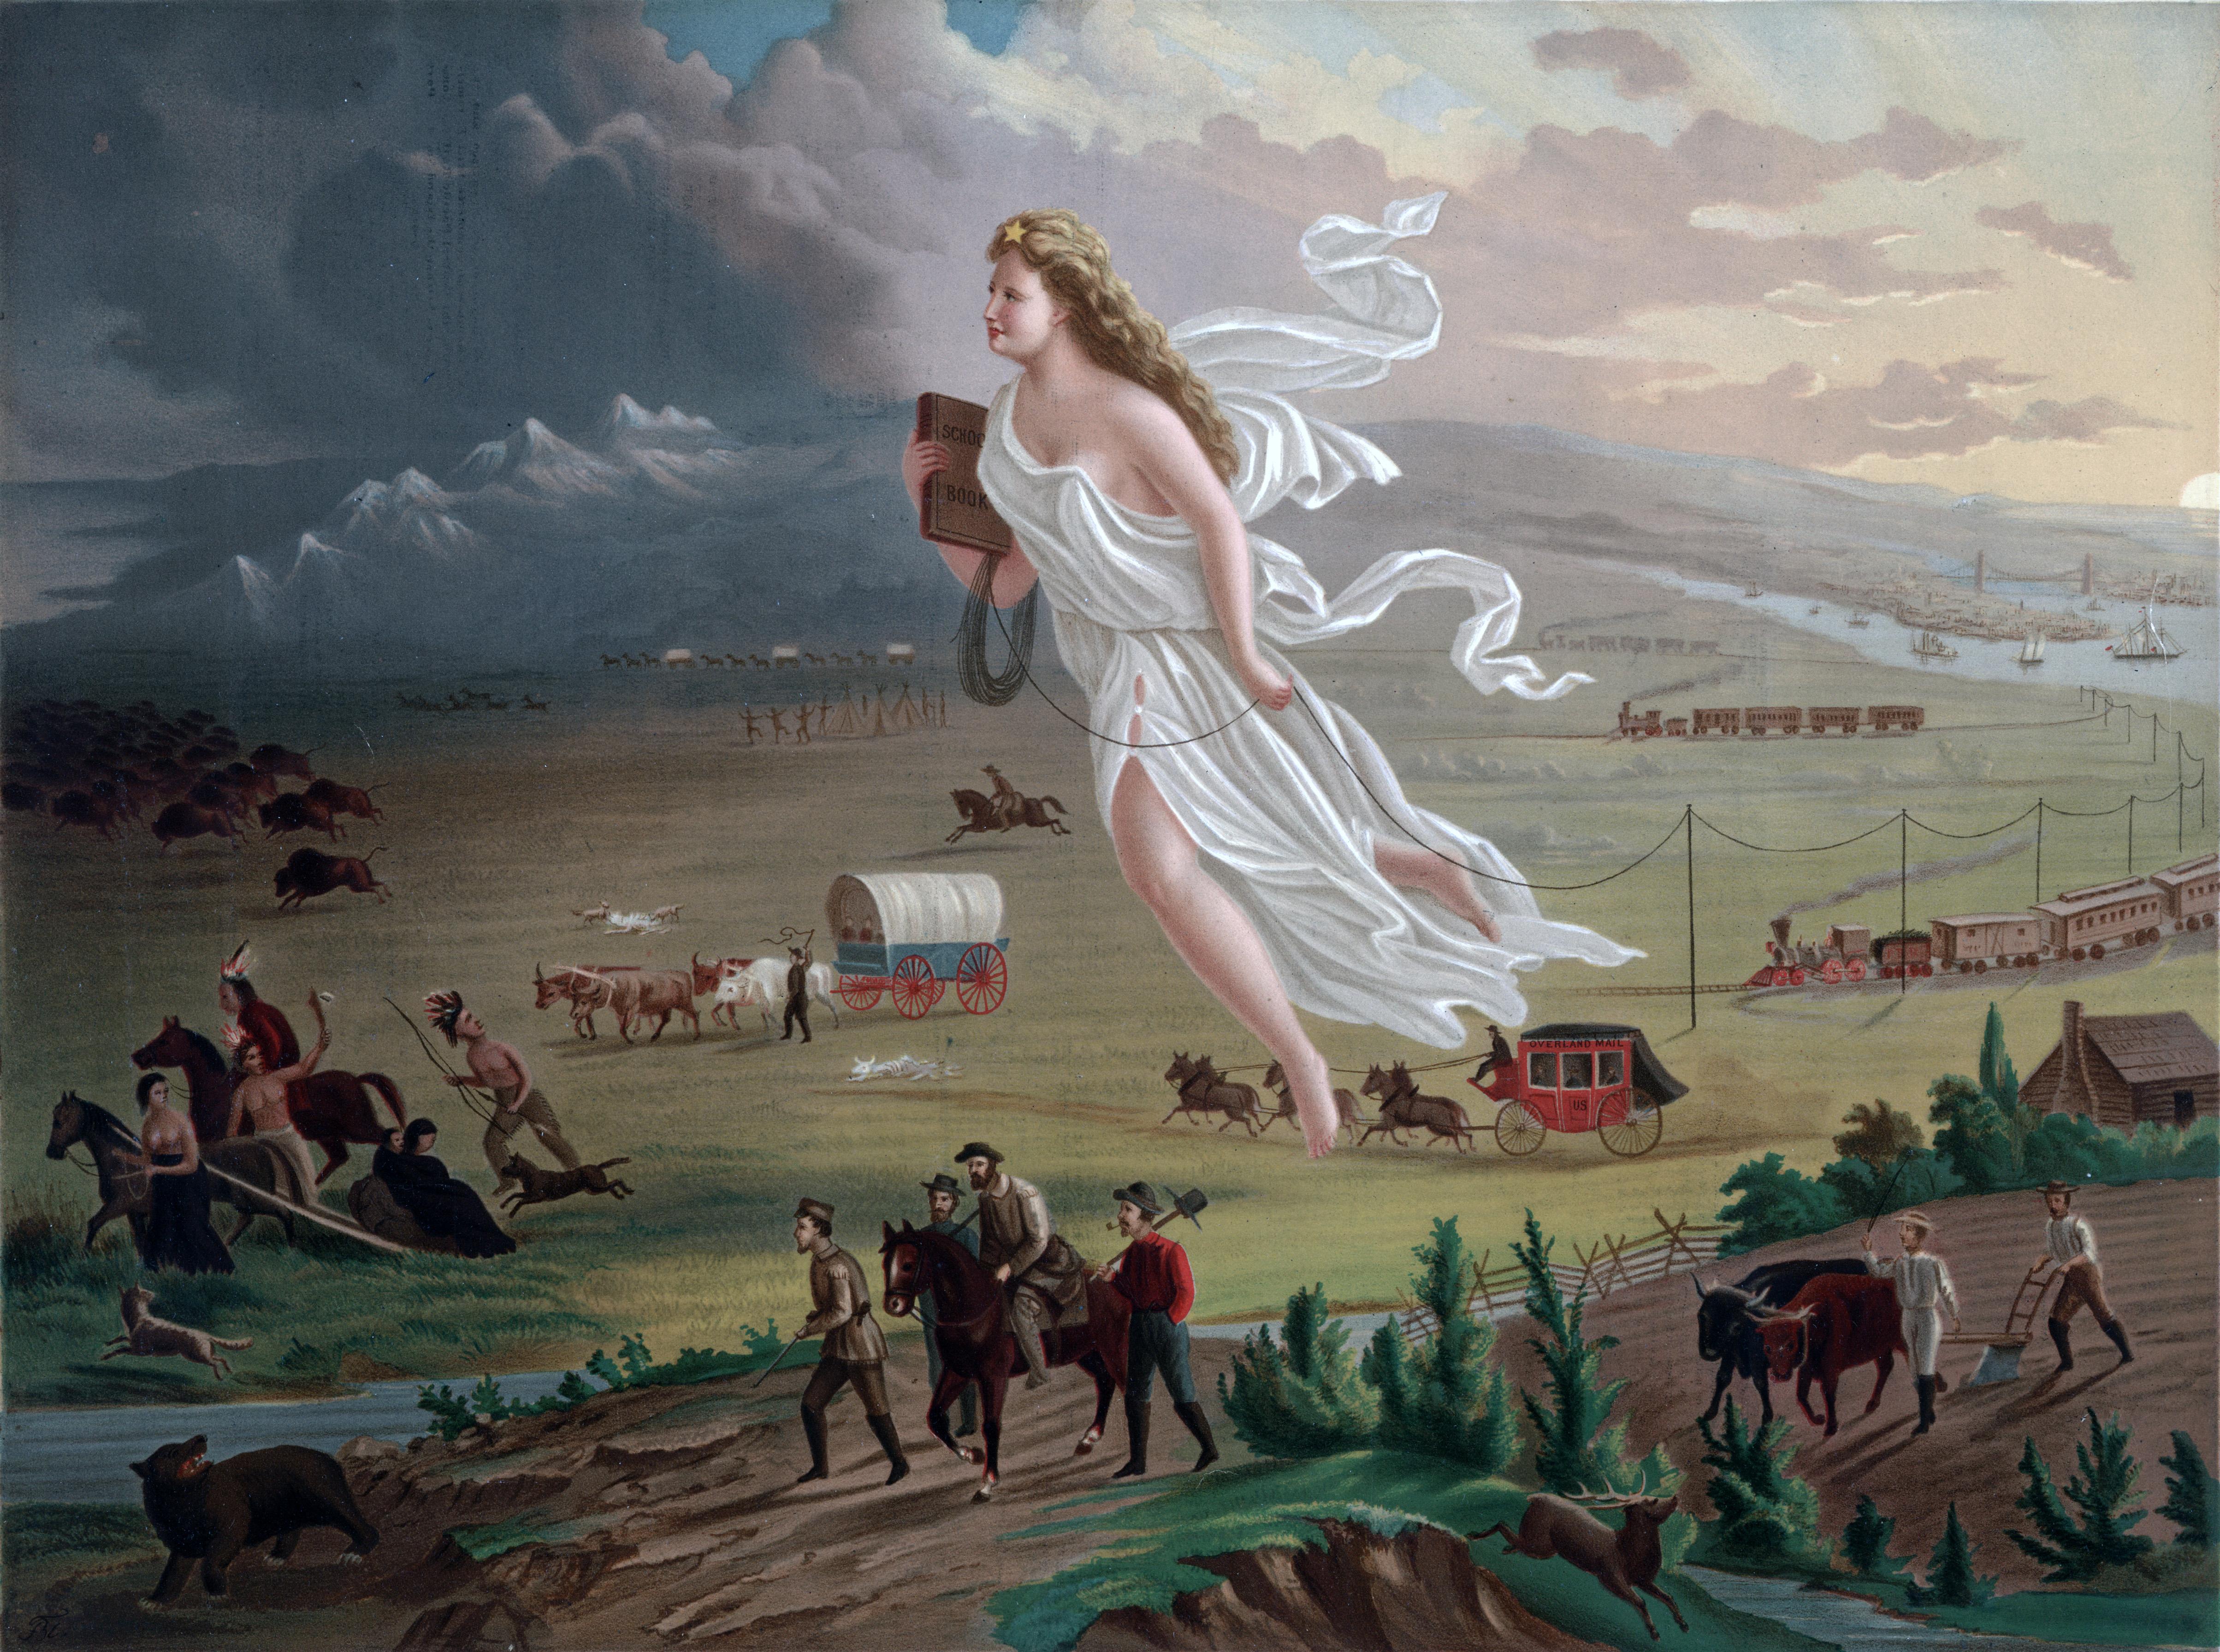 https://theunexpectedcosmology.com/wp-content/uploads/2020/07/American_Progress_28John_Gast_painting29.jpg